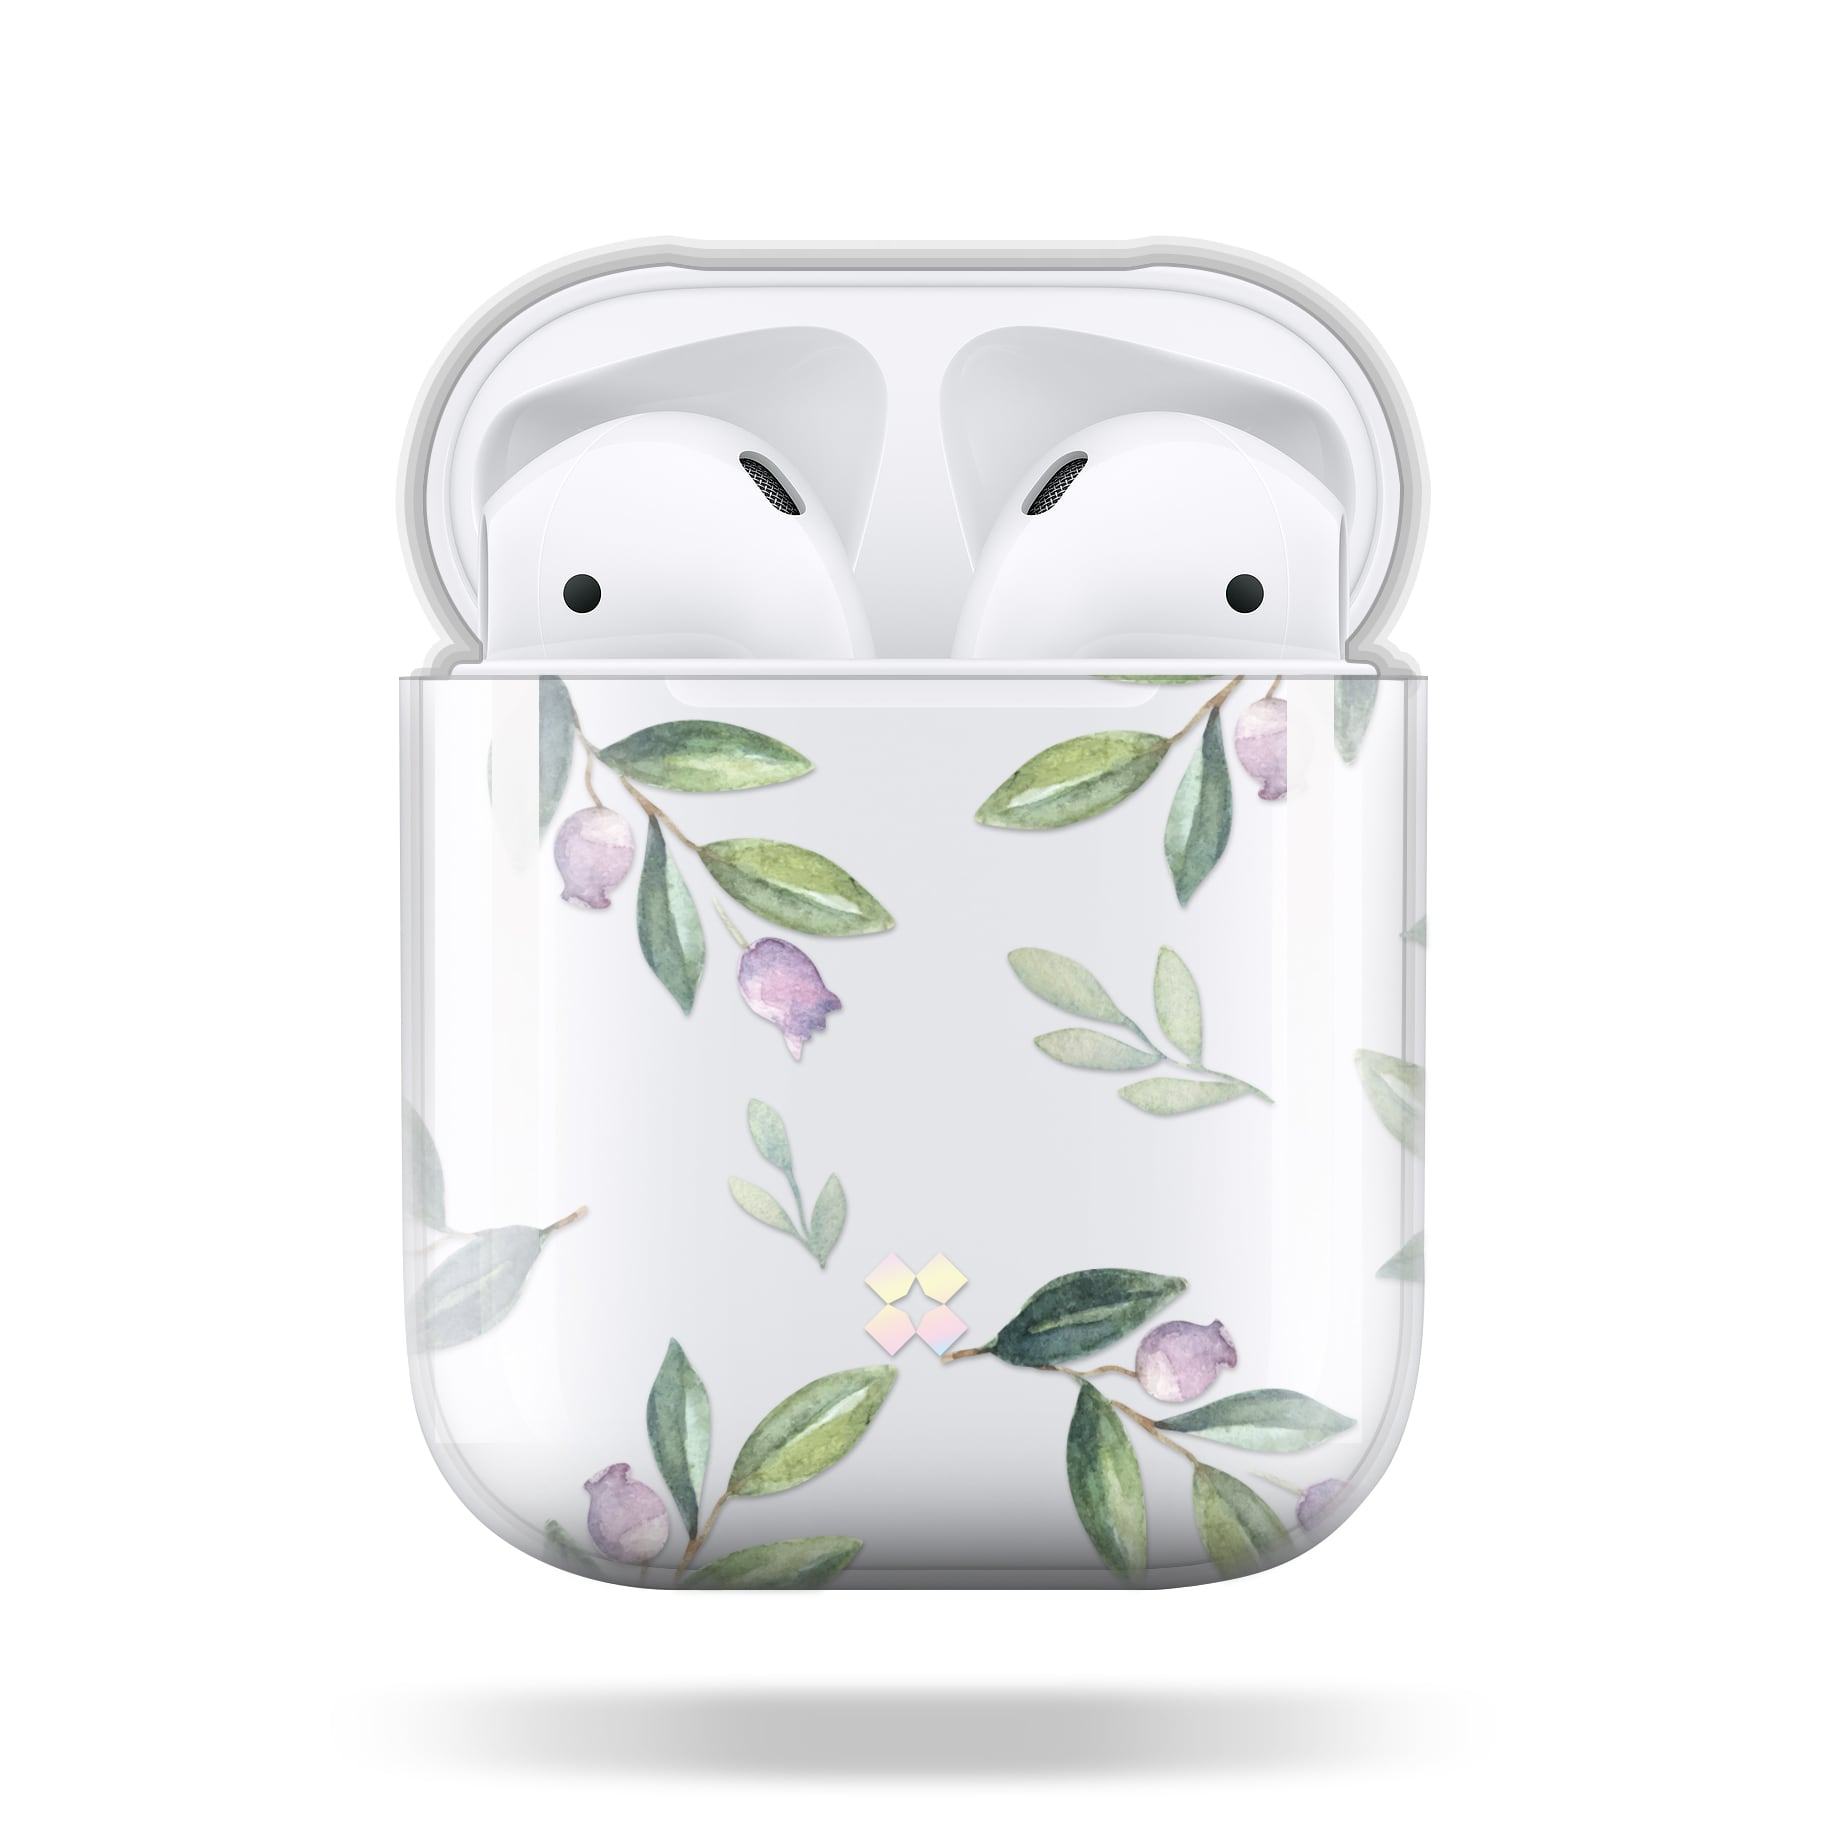 CaseStudi ケーススタディ PRISMART AirPods Case 2018 エアーポッズ ハード ケース 男女兼用 花 ブルーベリー Blueberry 国内正規品